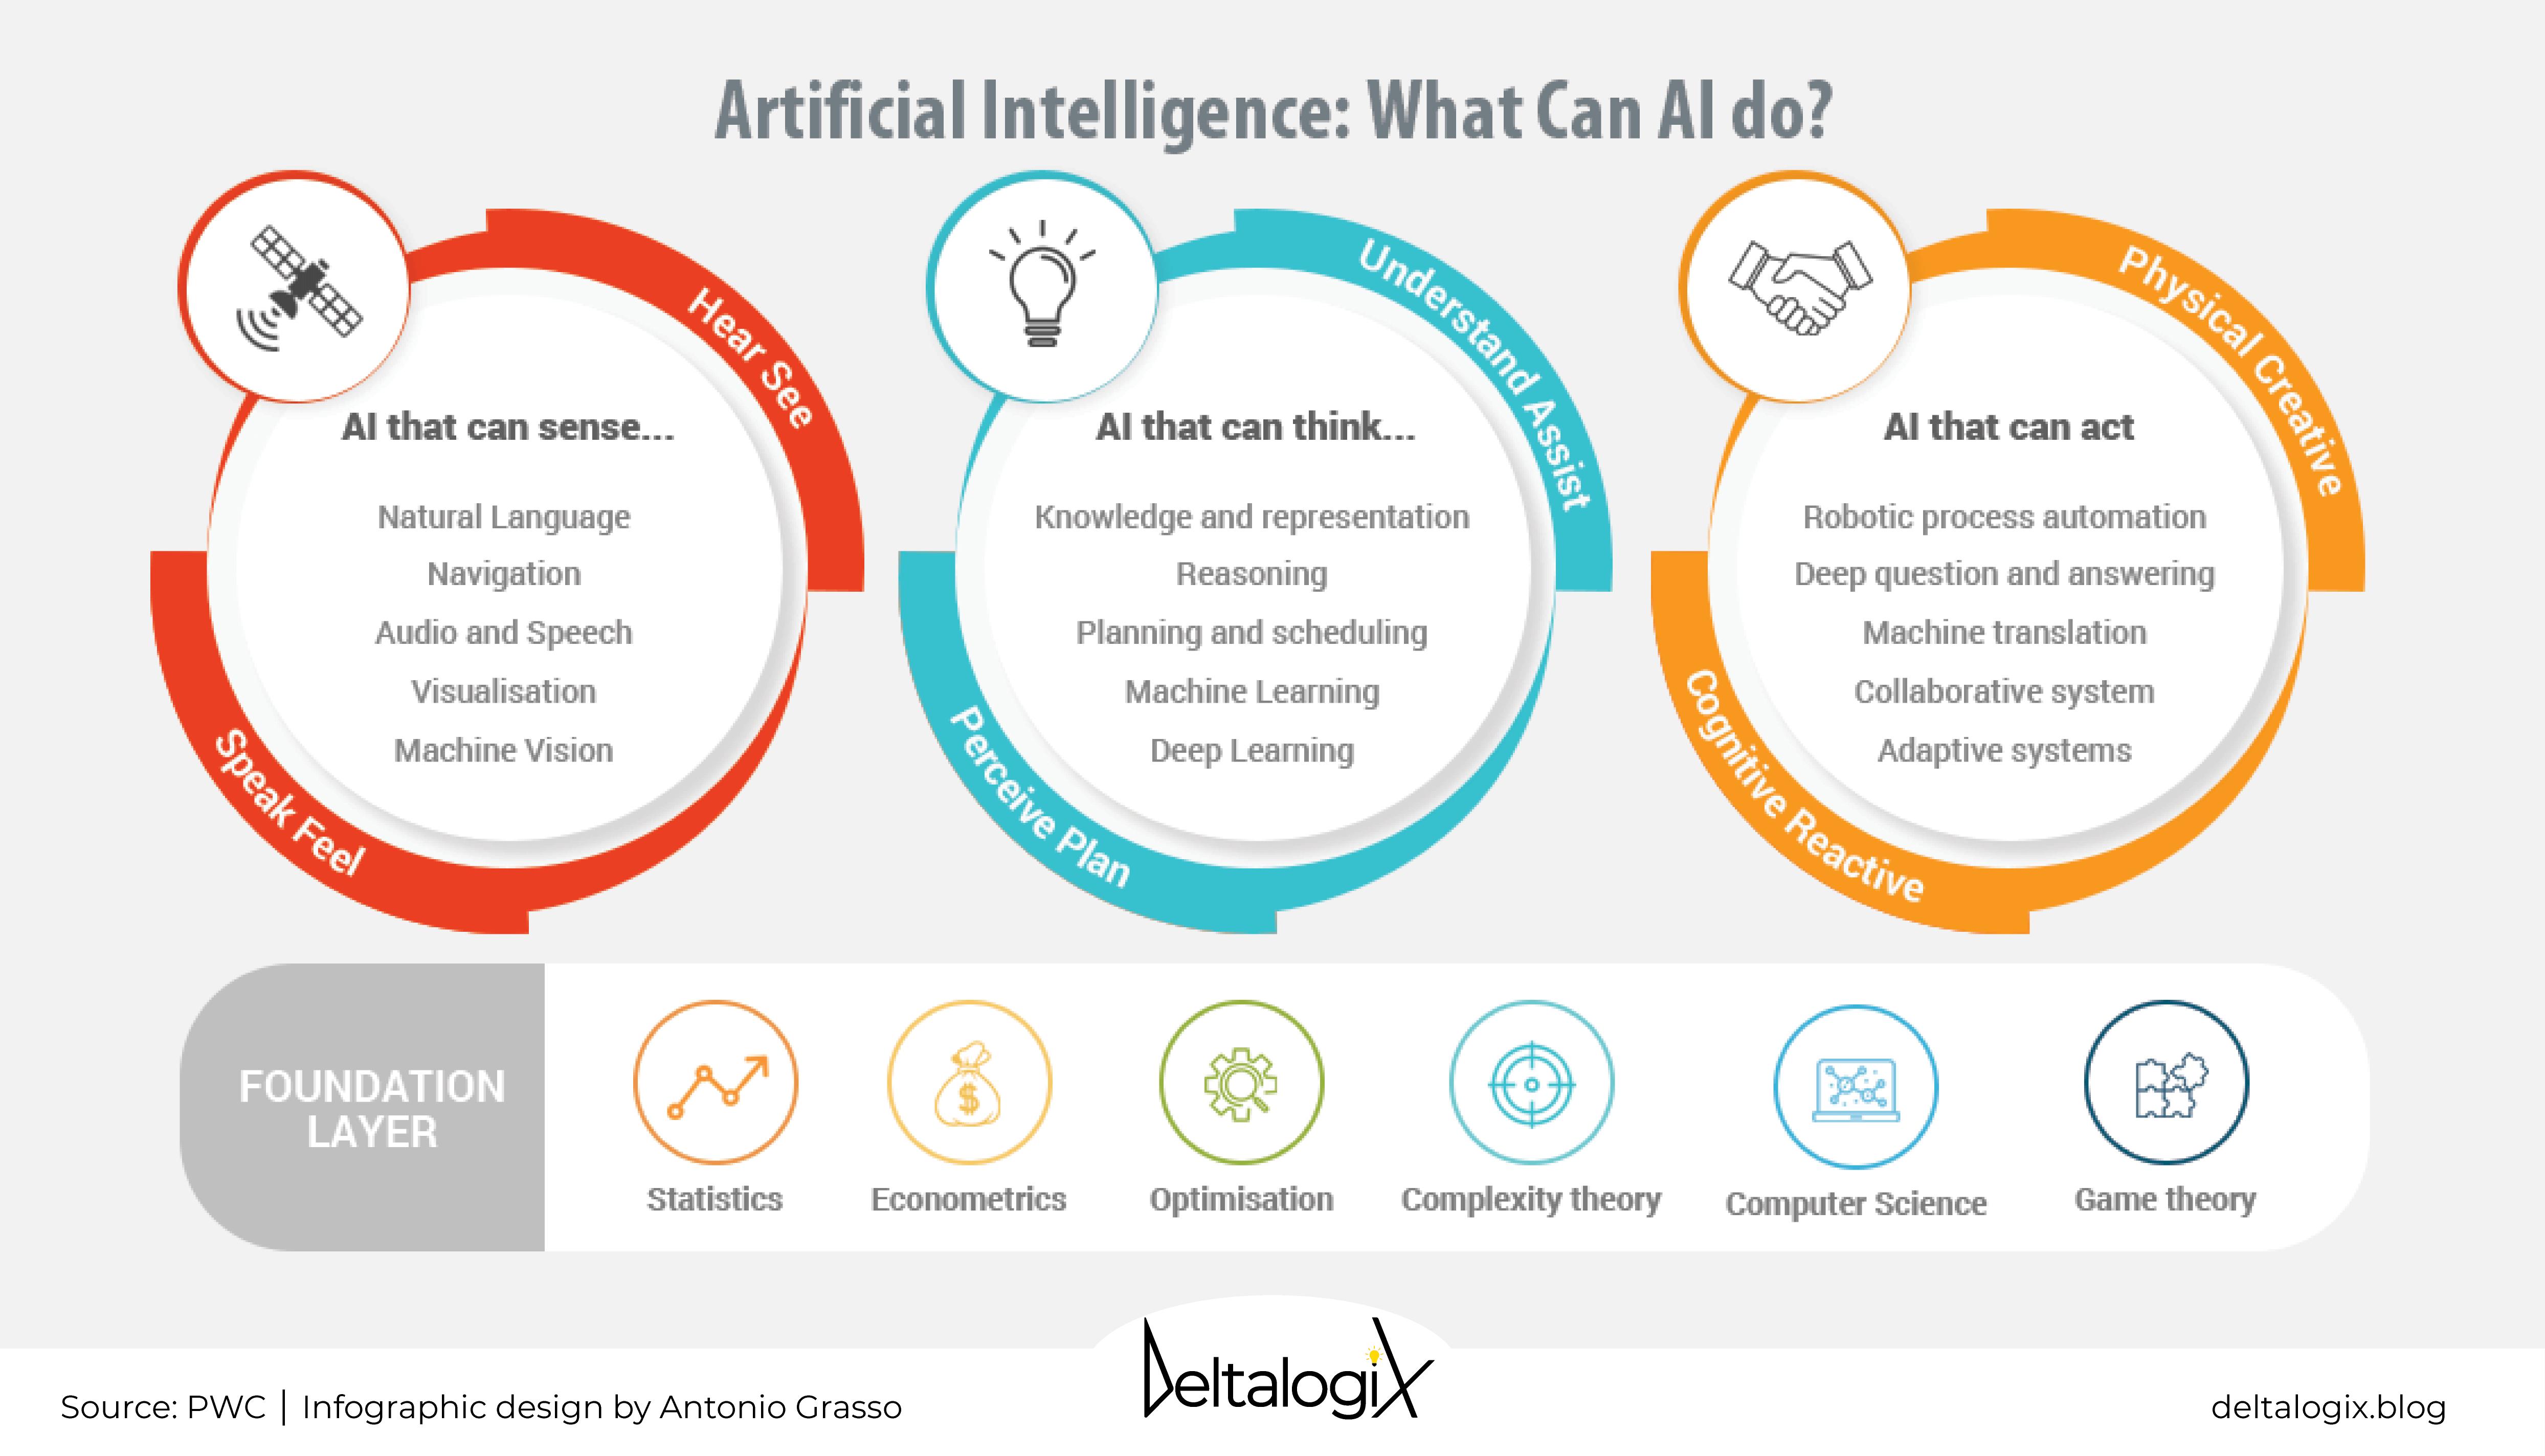 Artificial Intelligence senses